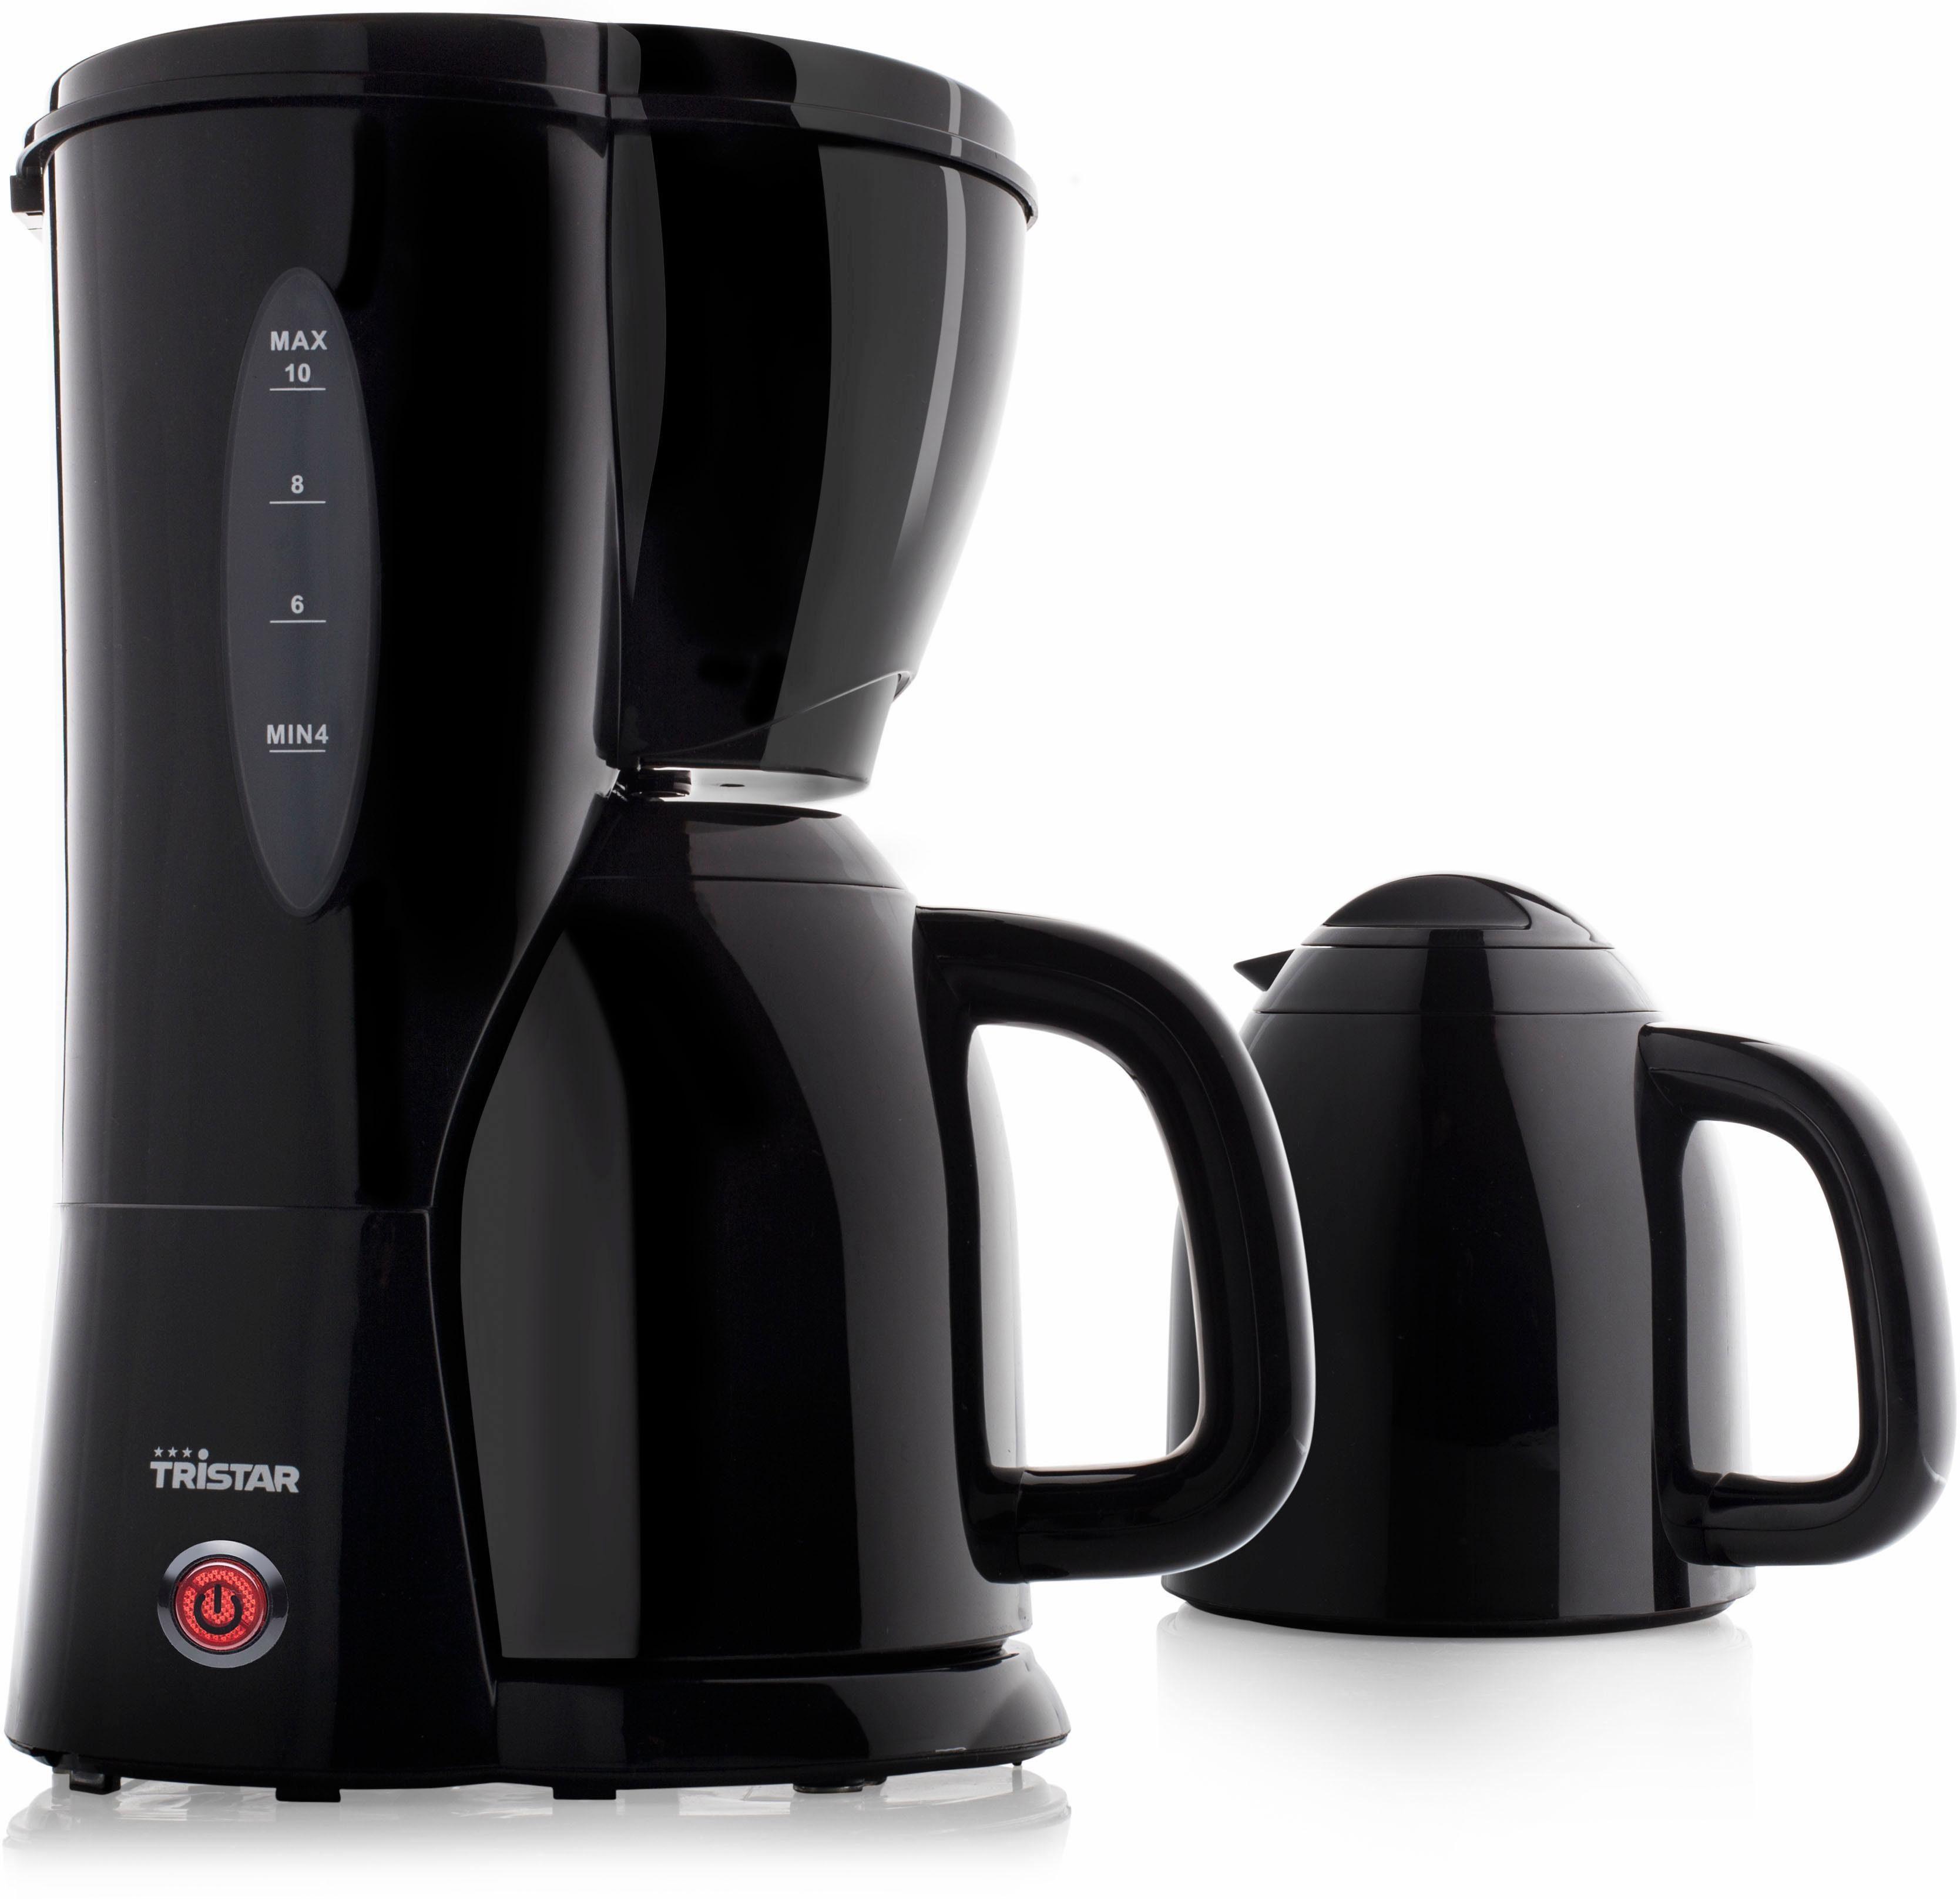 Tristar Filterkaffeemaschine Kaffeemaschine CM-1244, 1l Kaffeekanne, Papierfilter 1x4, mit 2 Isolierkannen